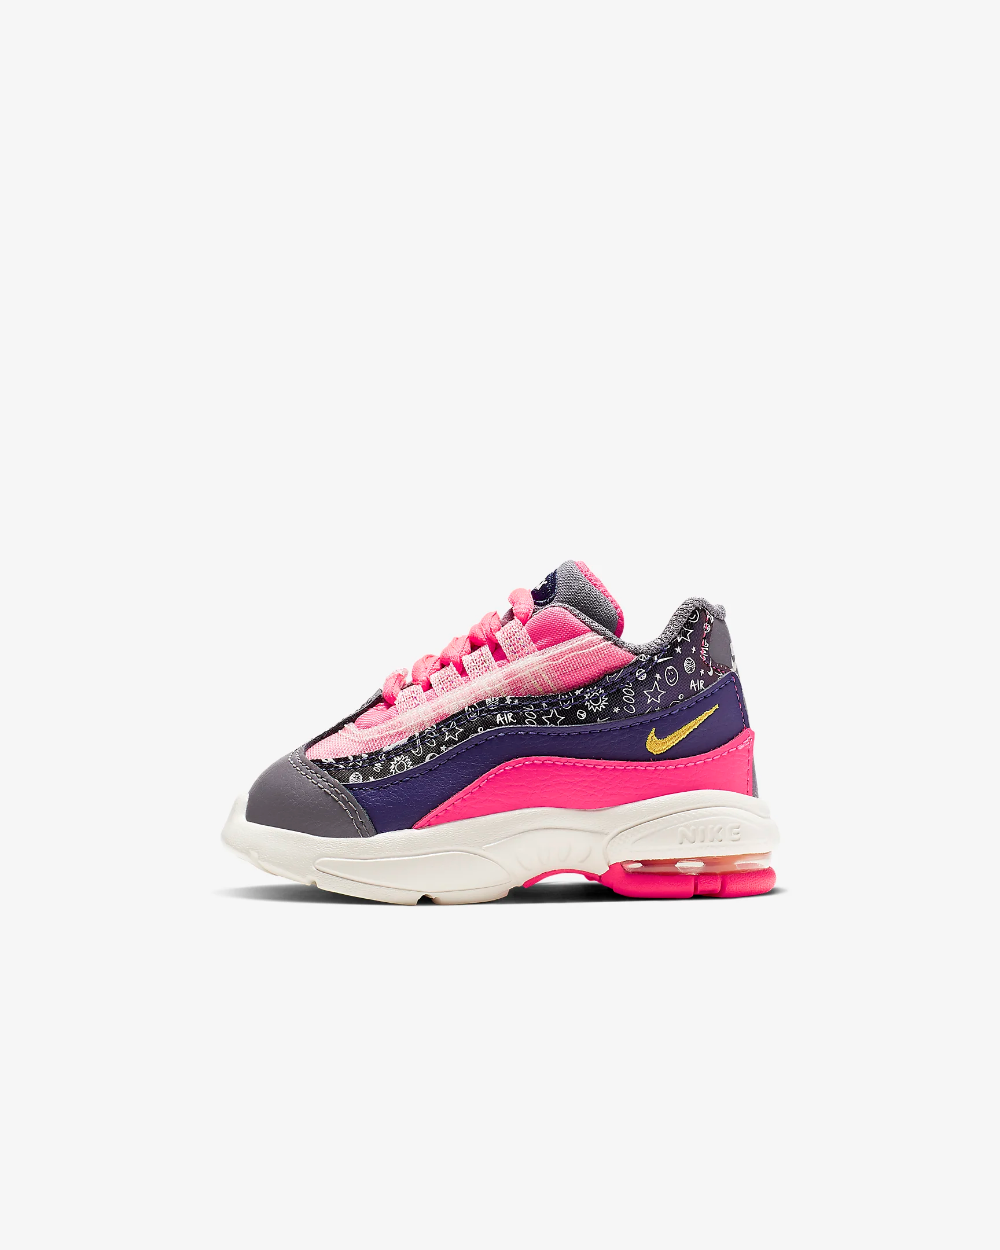 Toddler shoes, Nike shoes girls kids